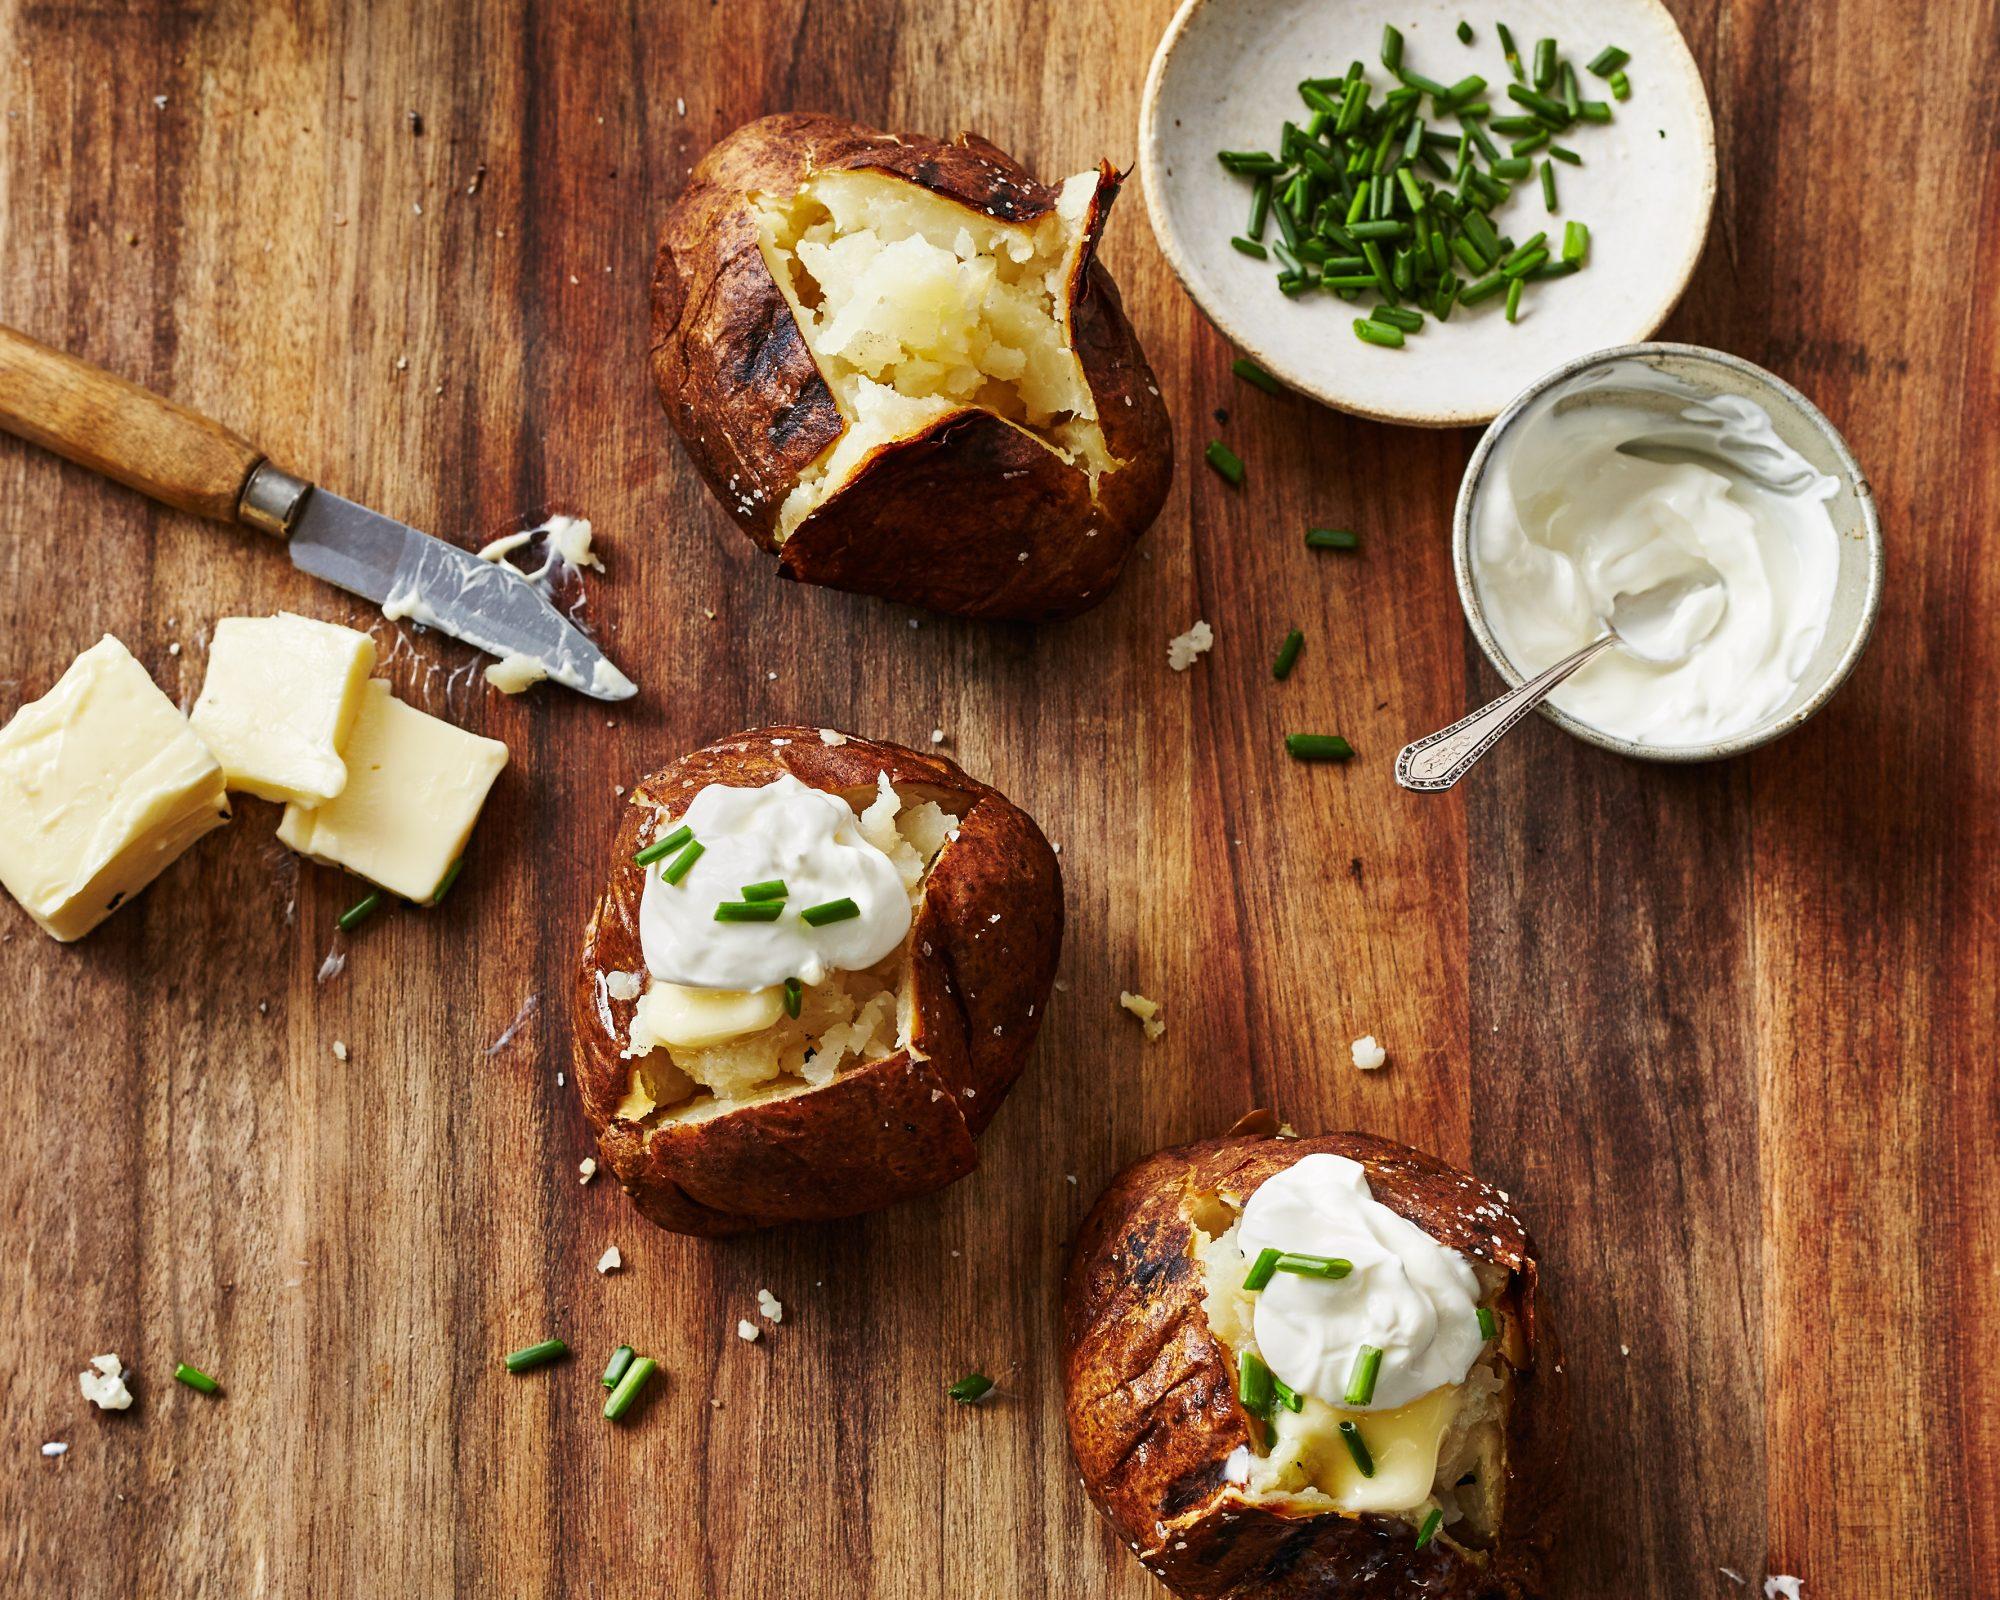 su- Baked Potatoes